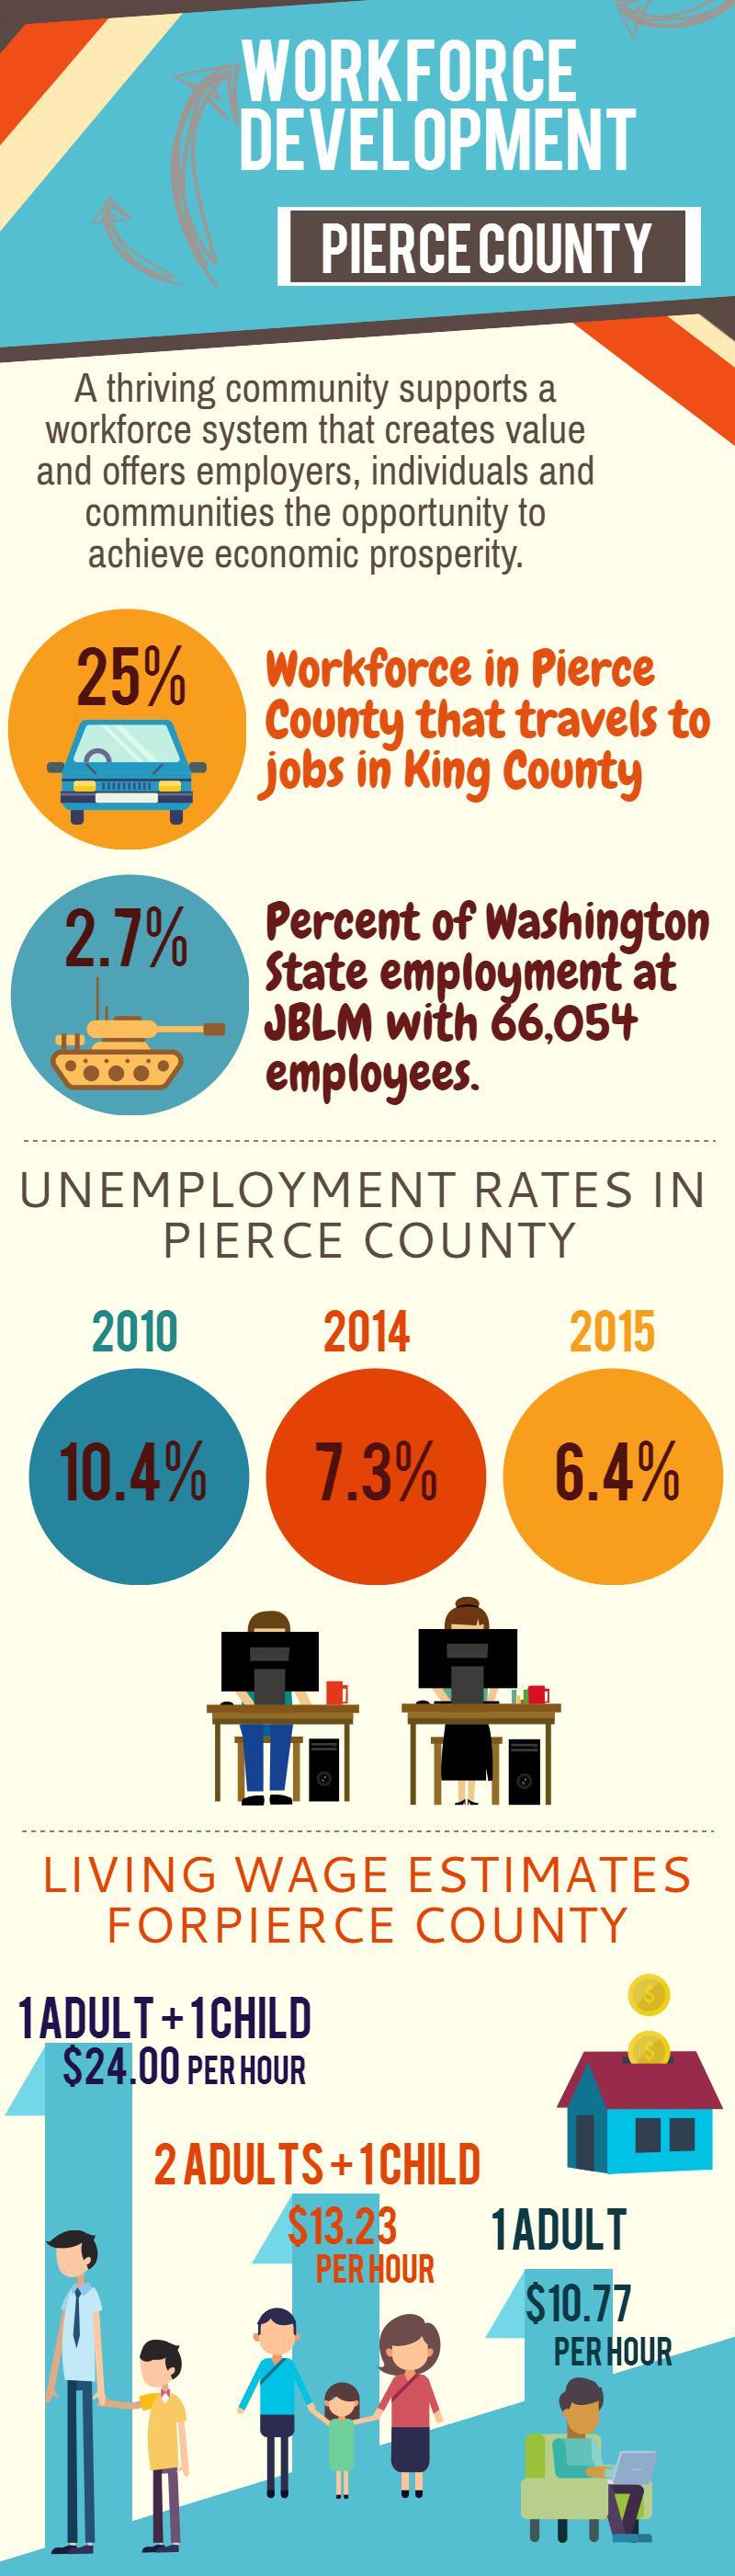 Workforce Development Infographic FINAL